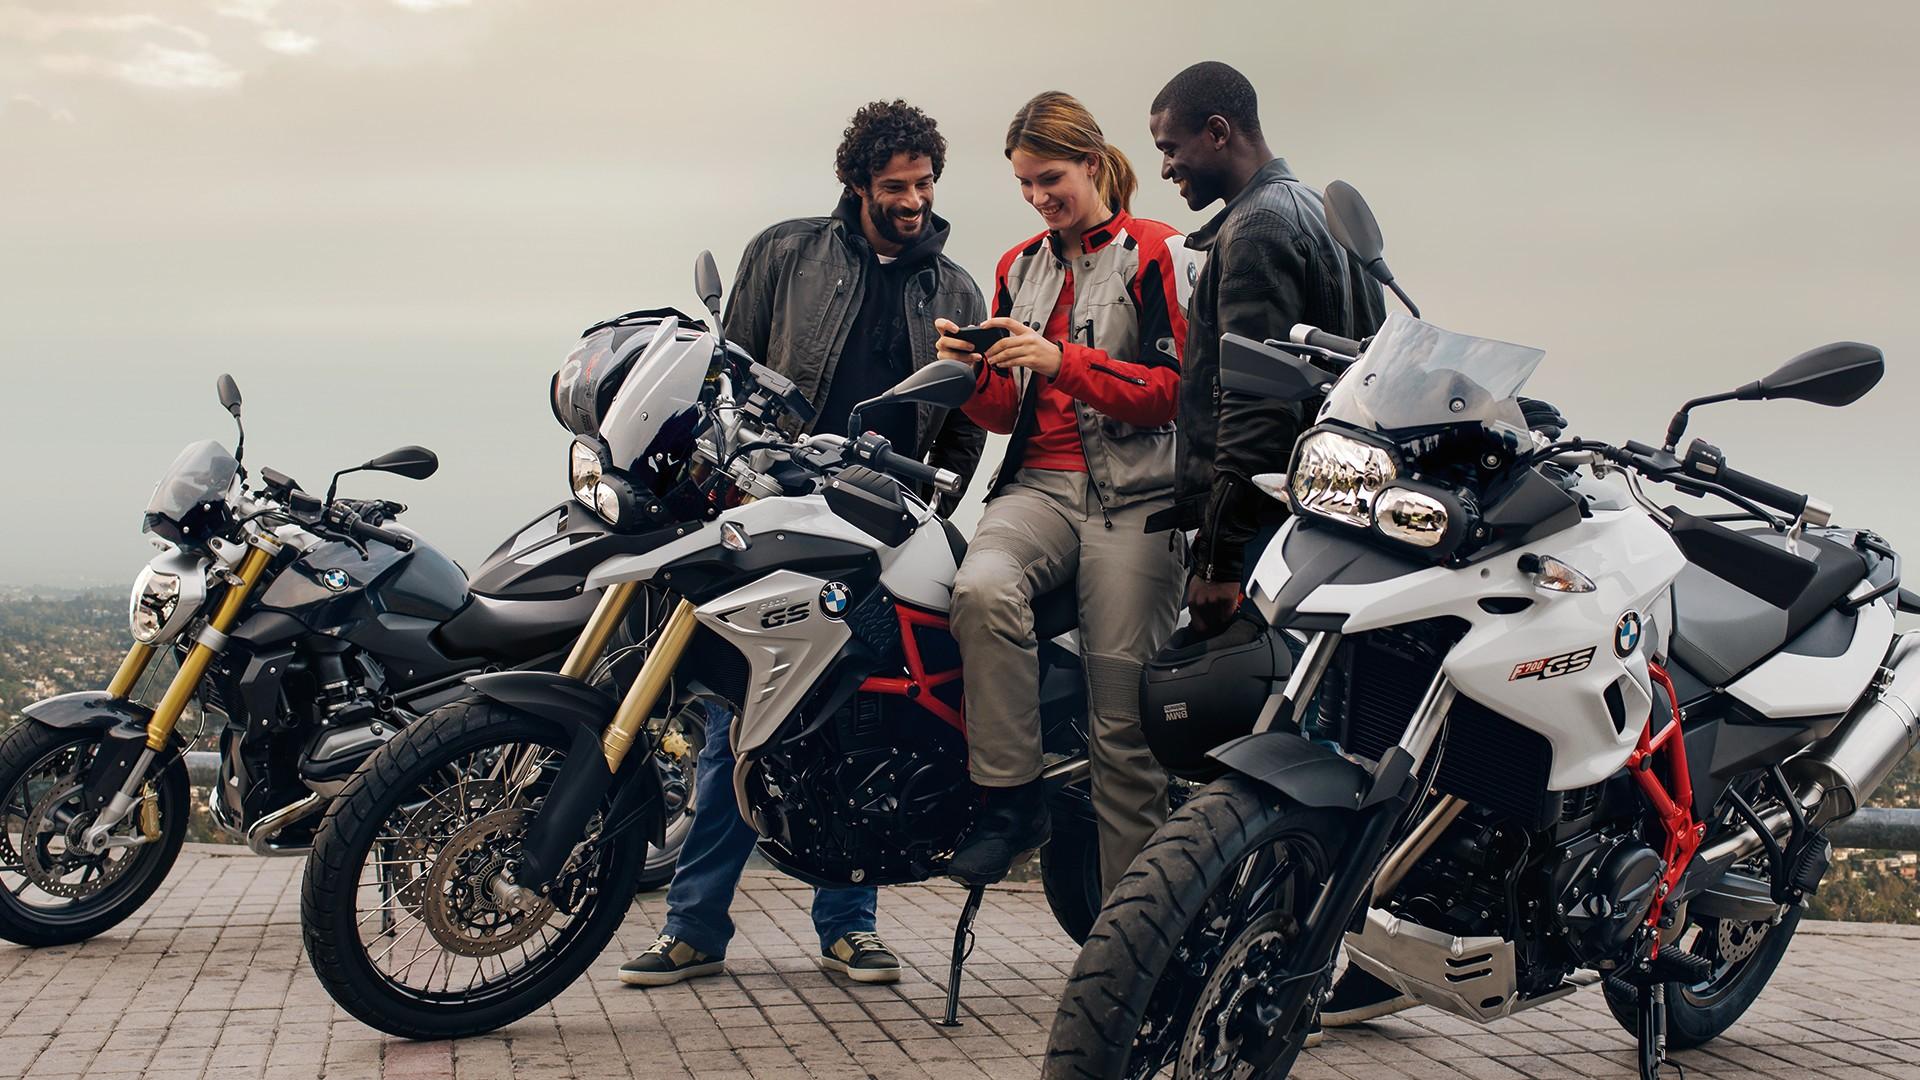 2009 год – 1 000 000 мотоциклов с ABS